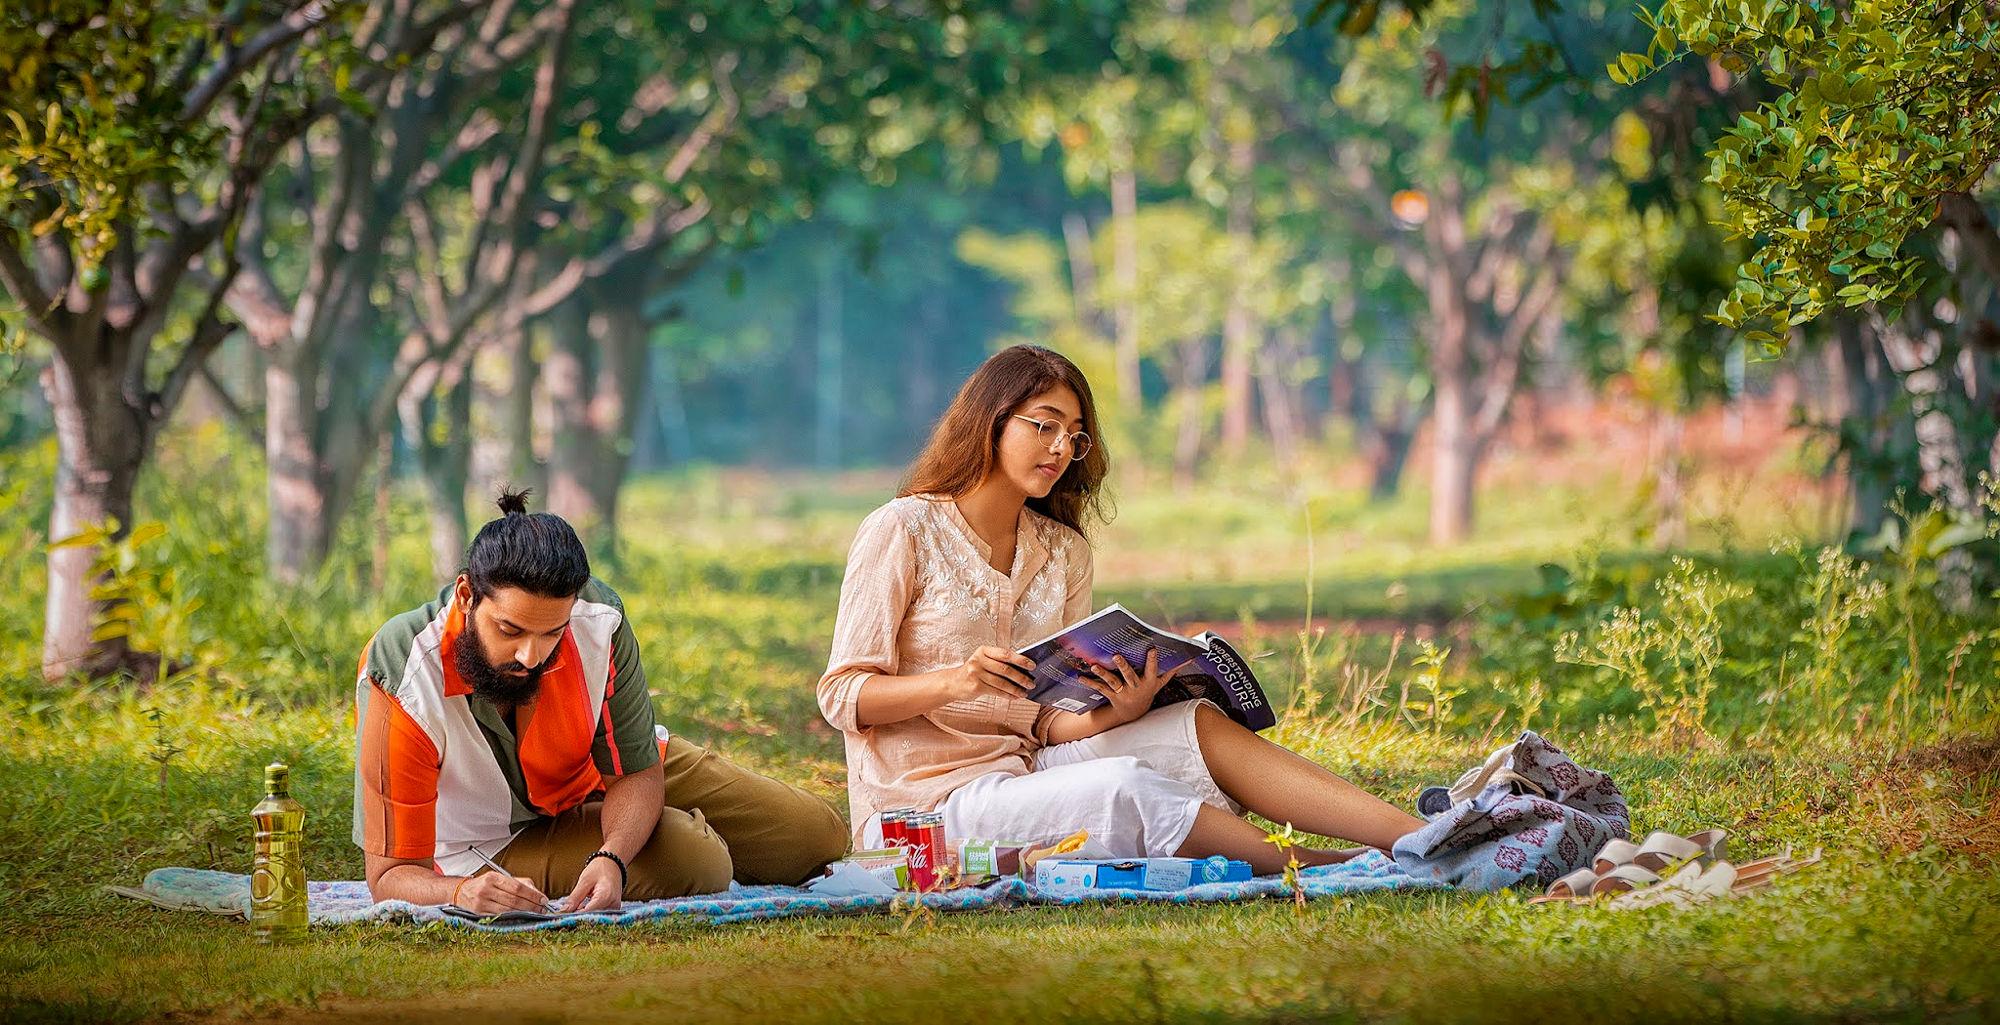 Sumanth Ashwin Mehar Chawal 7 Days 6 Nights Movie HD Pics